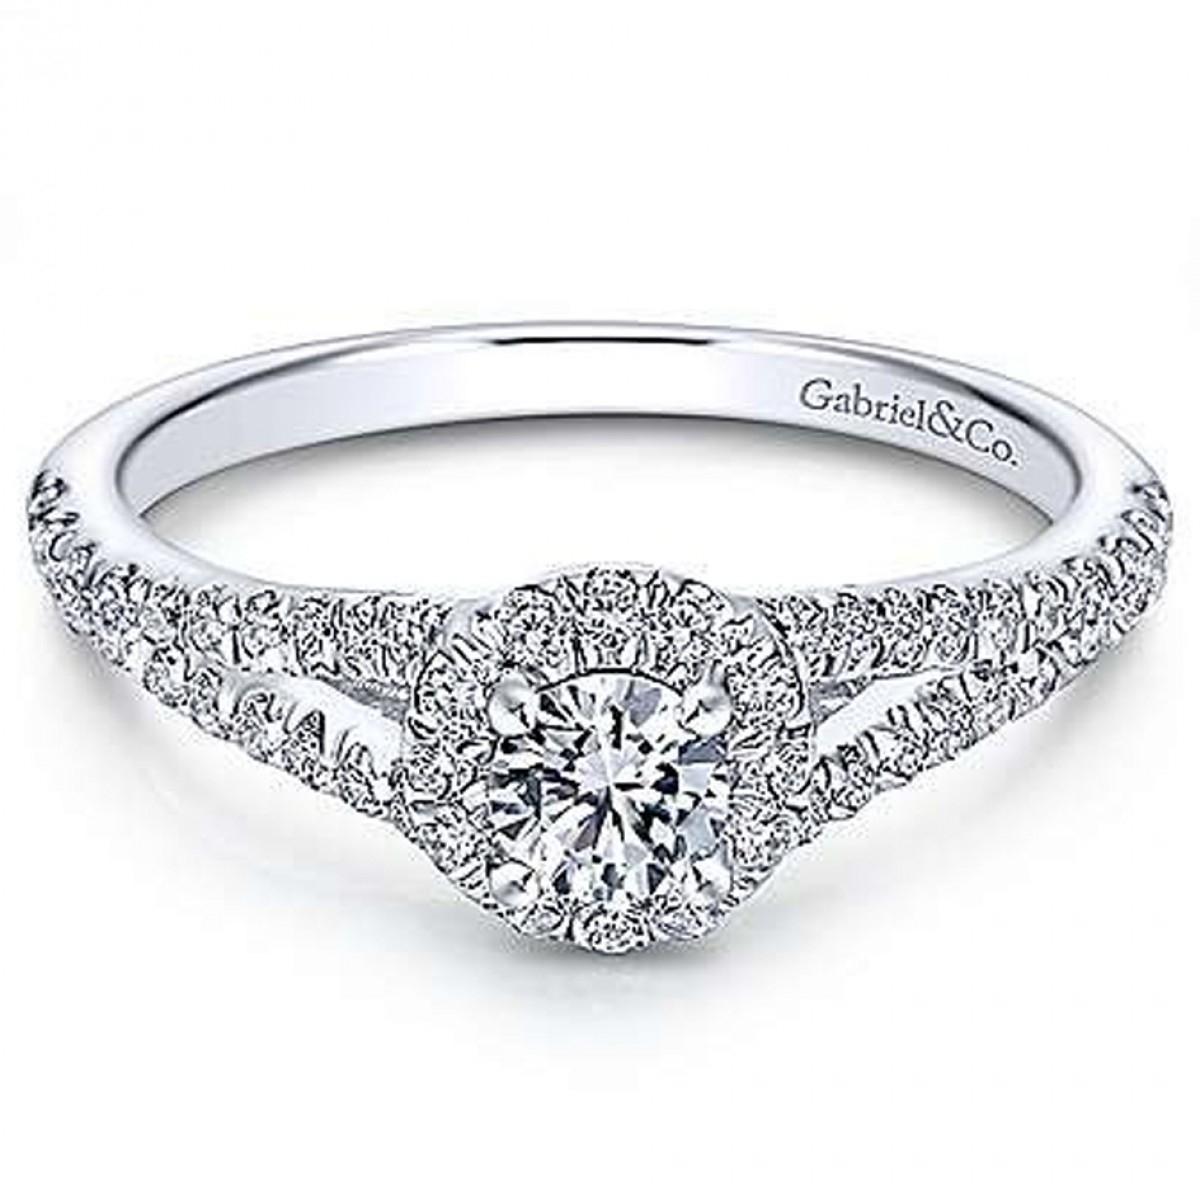 Ribbon 14K White Gold Preset Split Shank Halo Round Diamond Engagement Ring  (0.62 Ct. Tw (View 15 of 25)